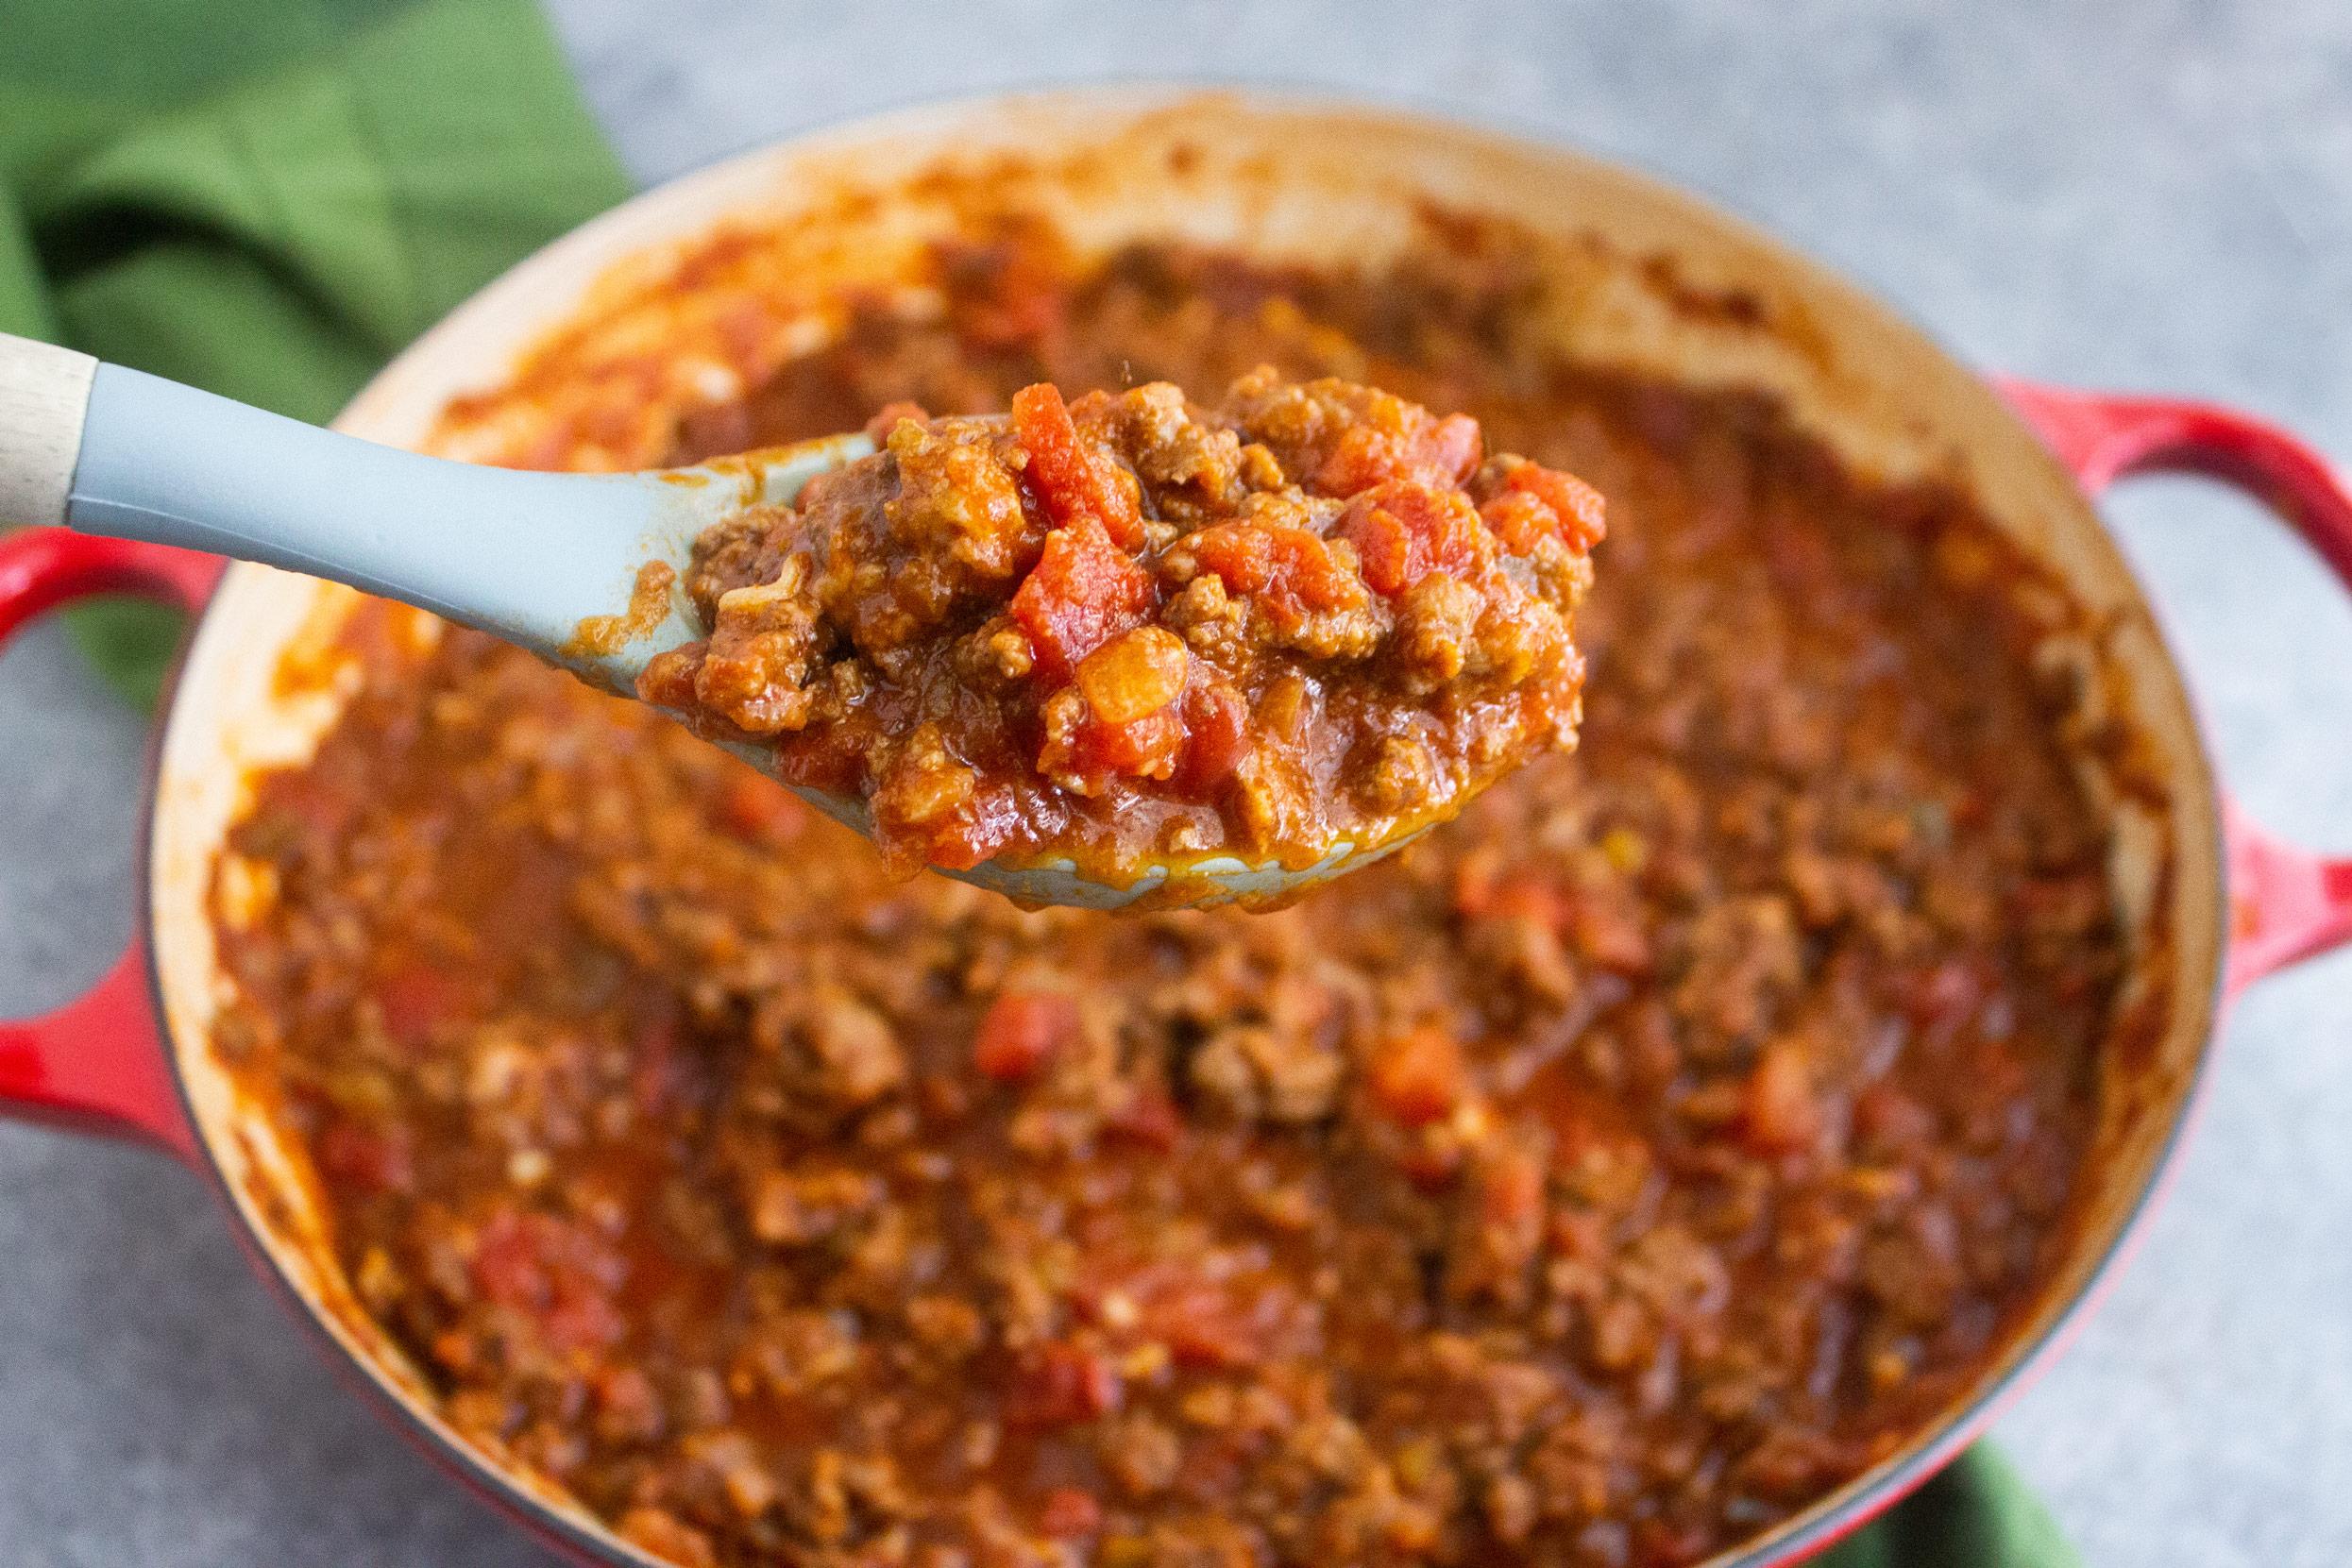 Spaghetti sauce, doctored up spaghetti sauce